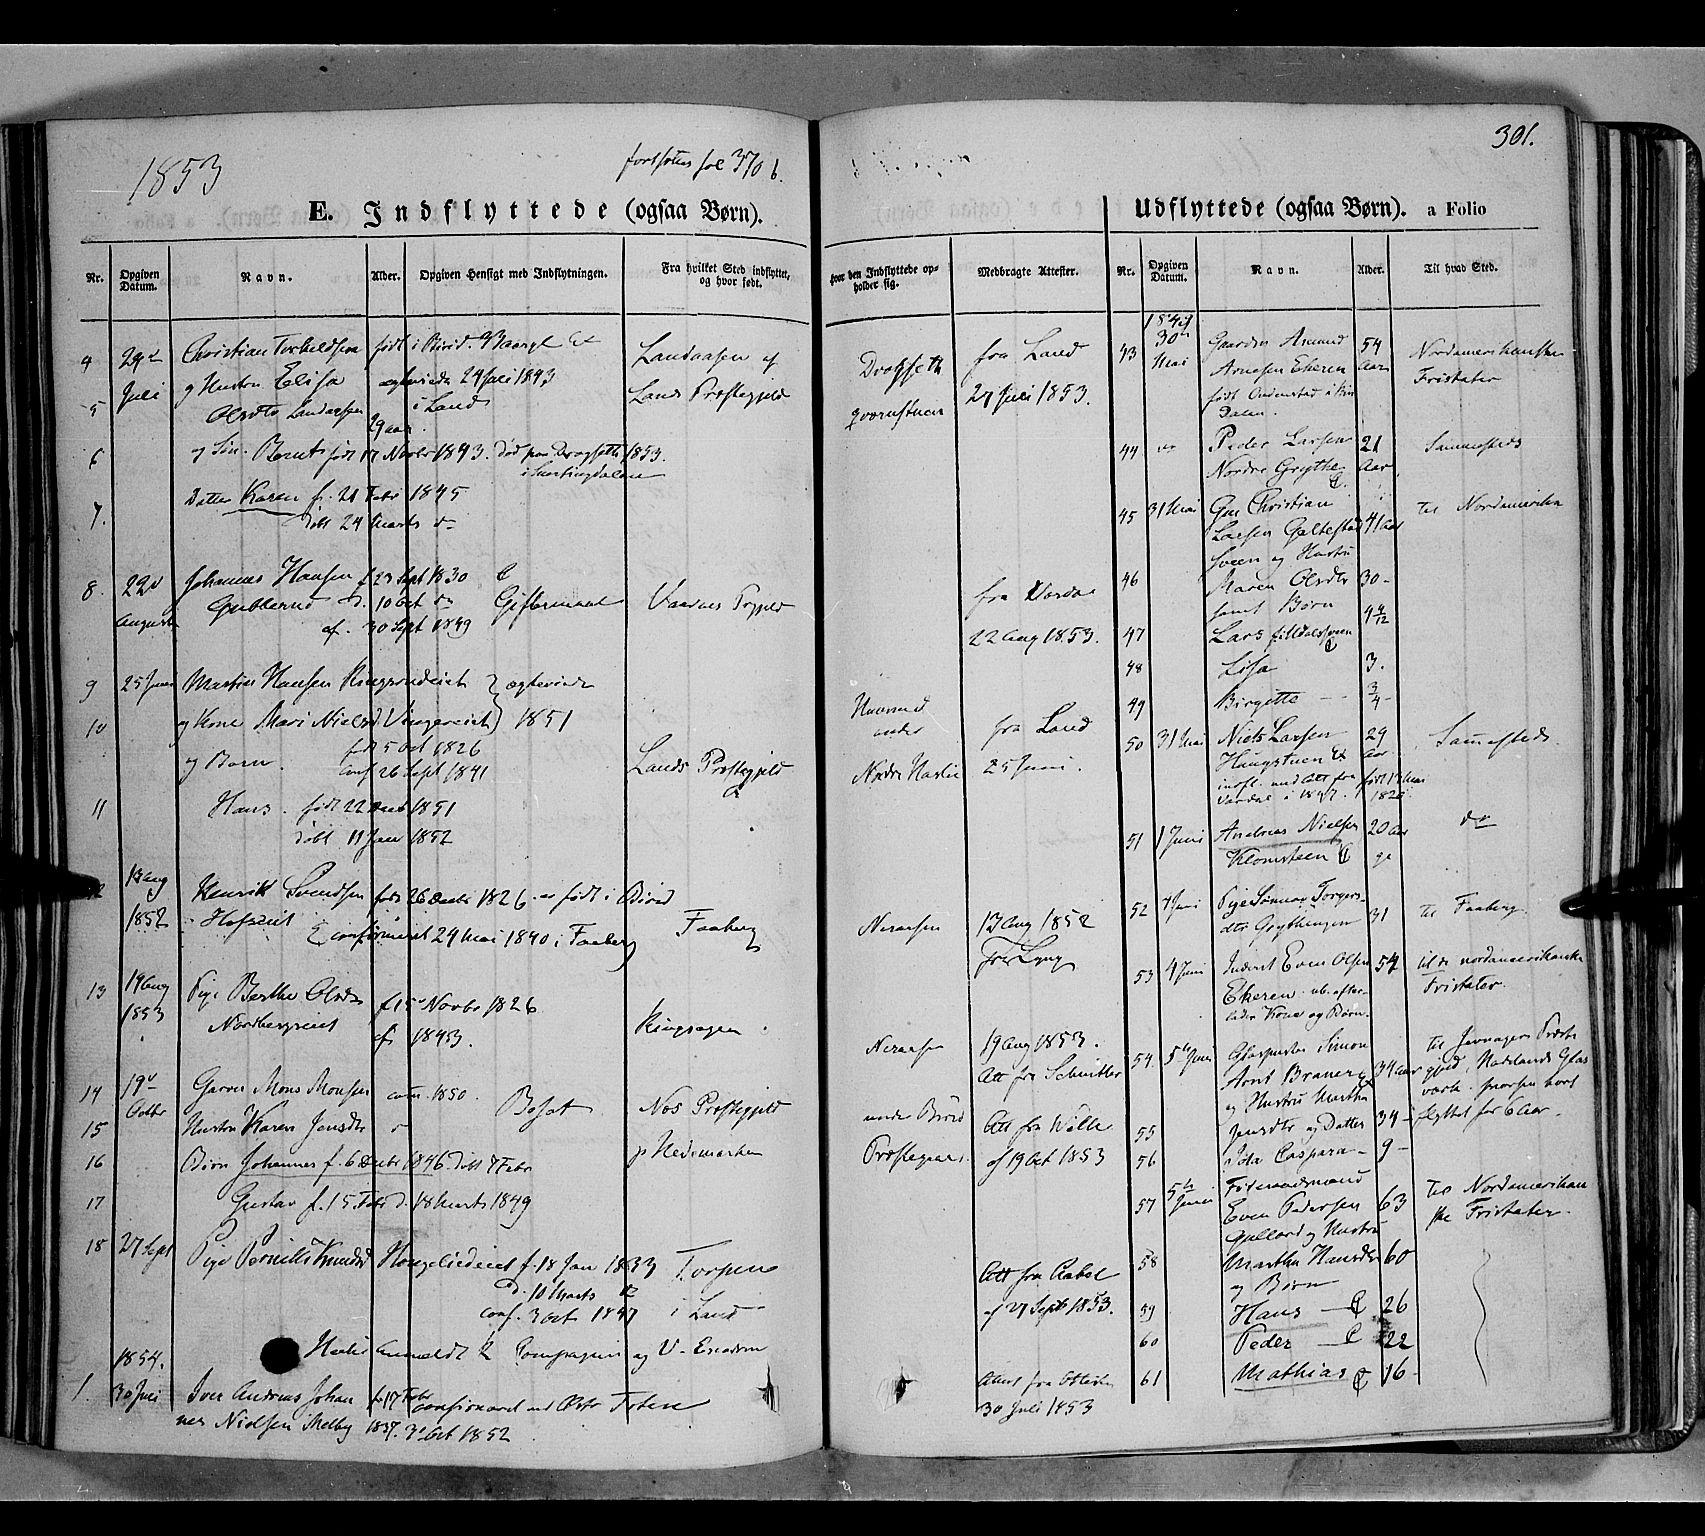 SAH, Biri prestekontor, Ministerialbok nr. 5, 1843-1854, s. 301